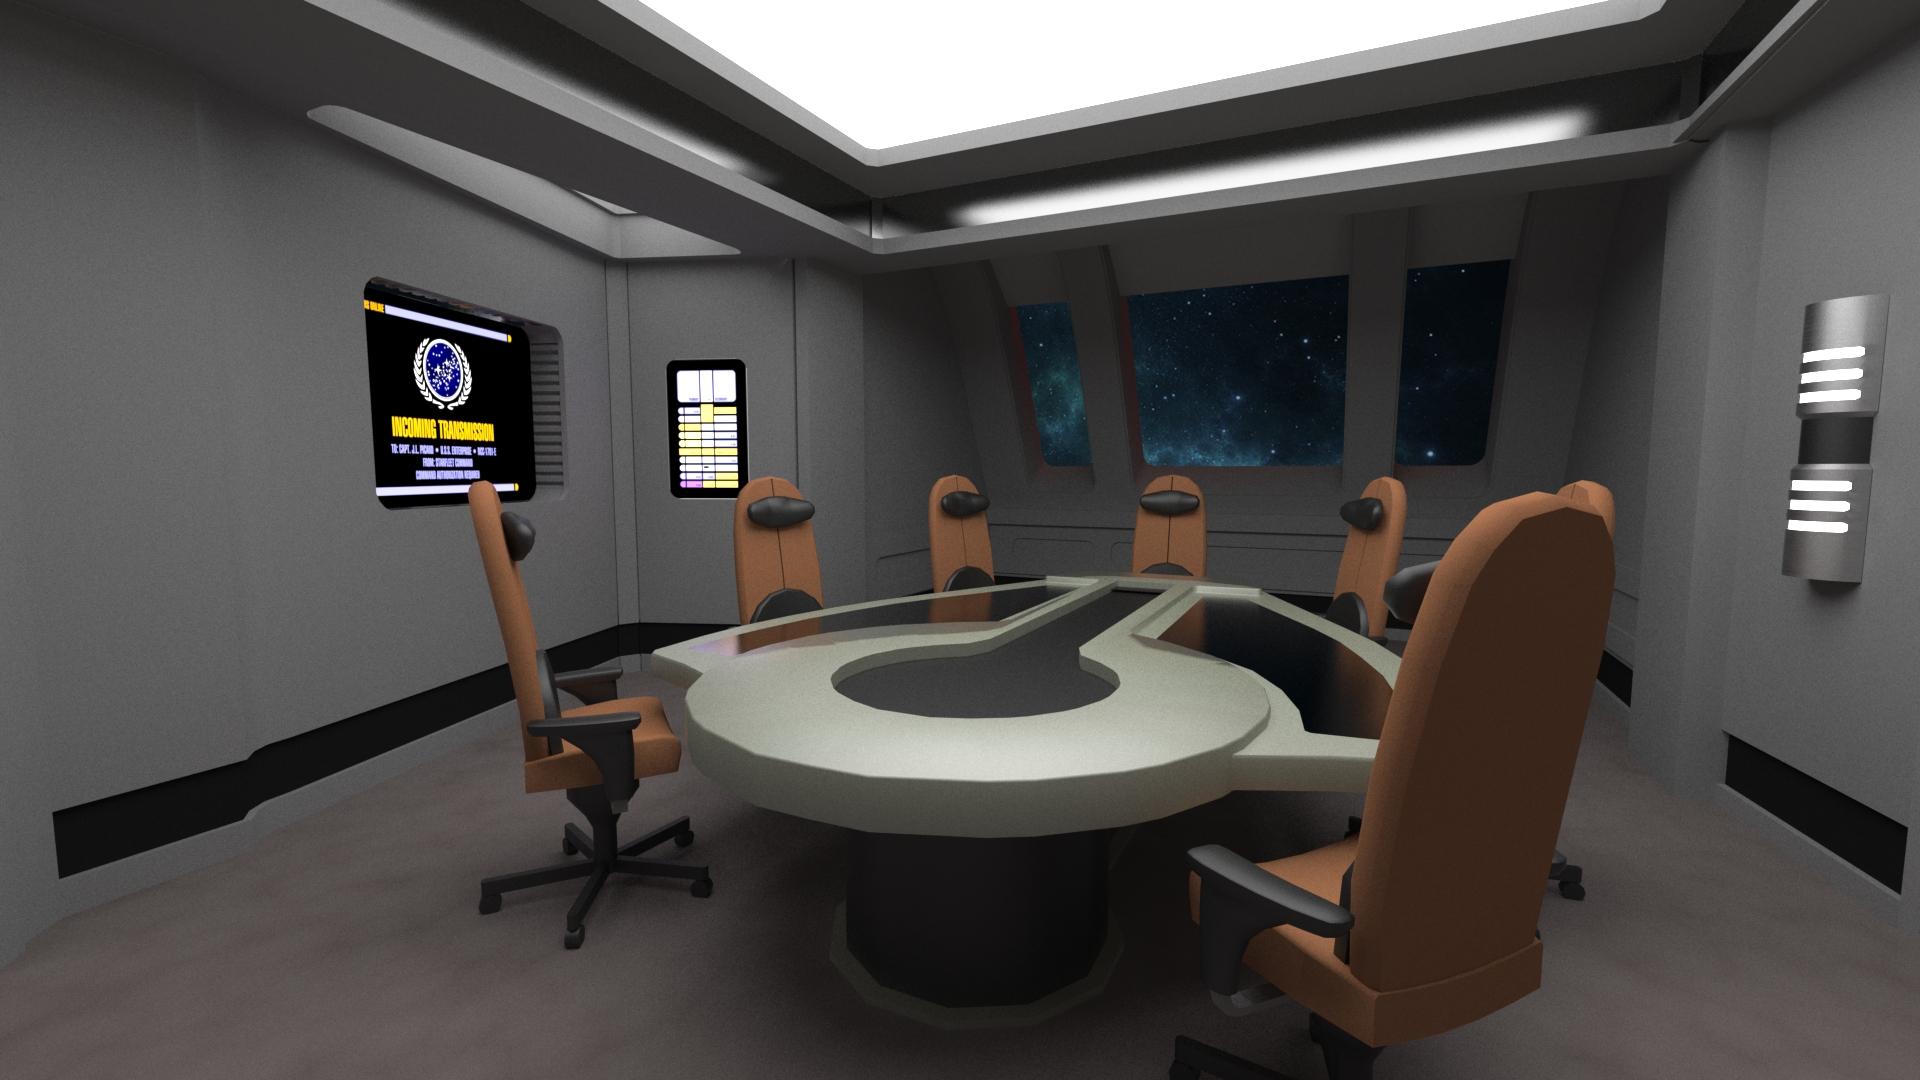 Briefing Room Wip Image Star Trek Voyager Game Project